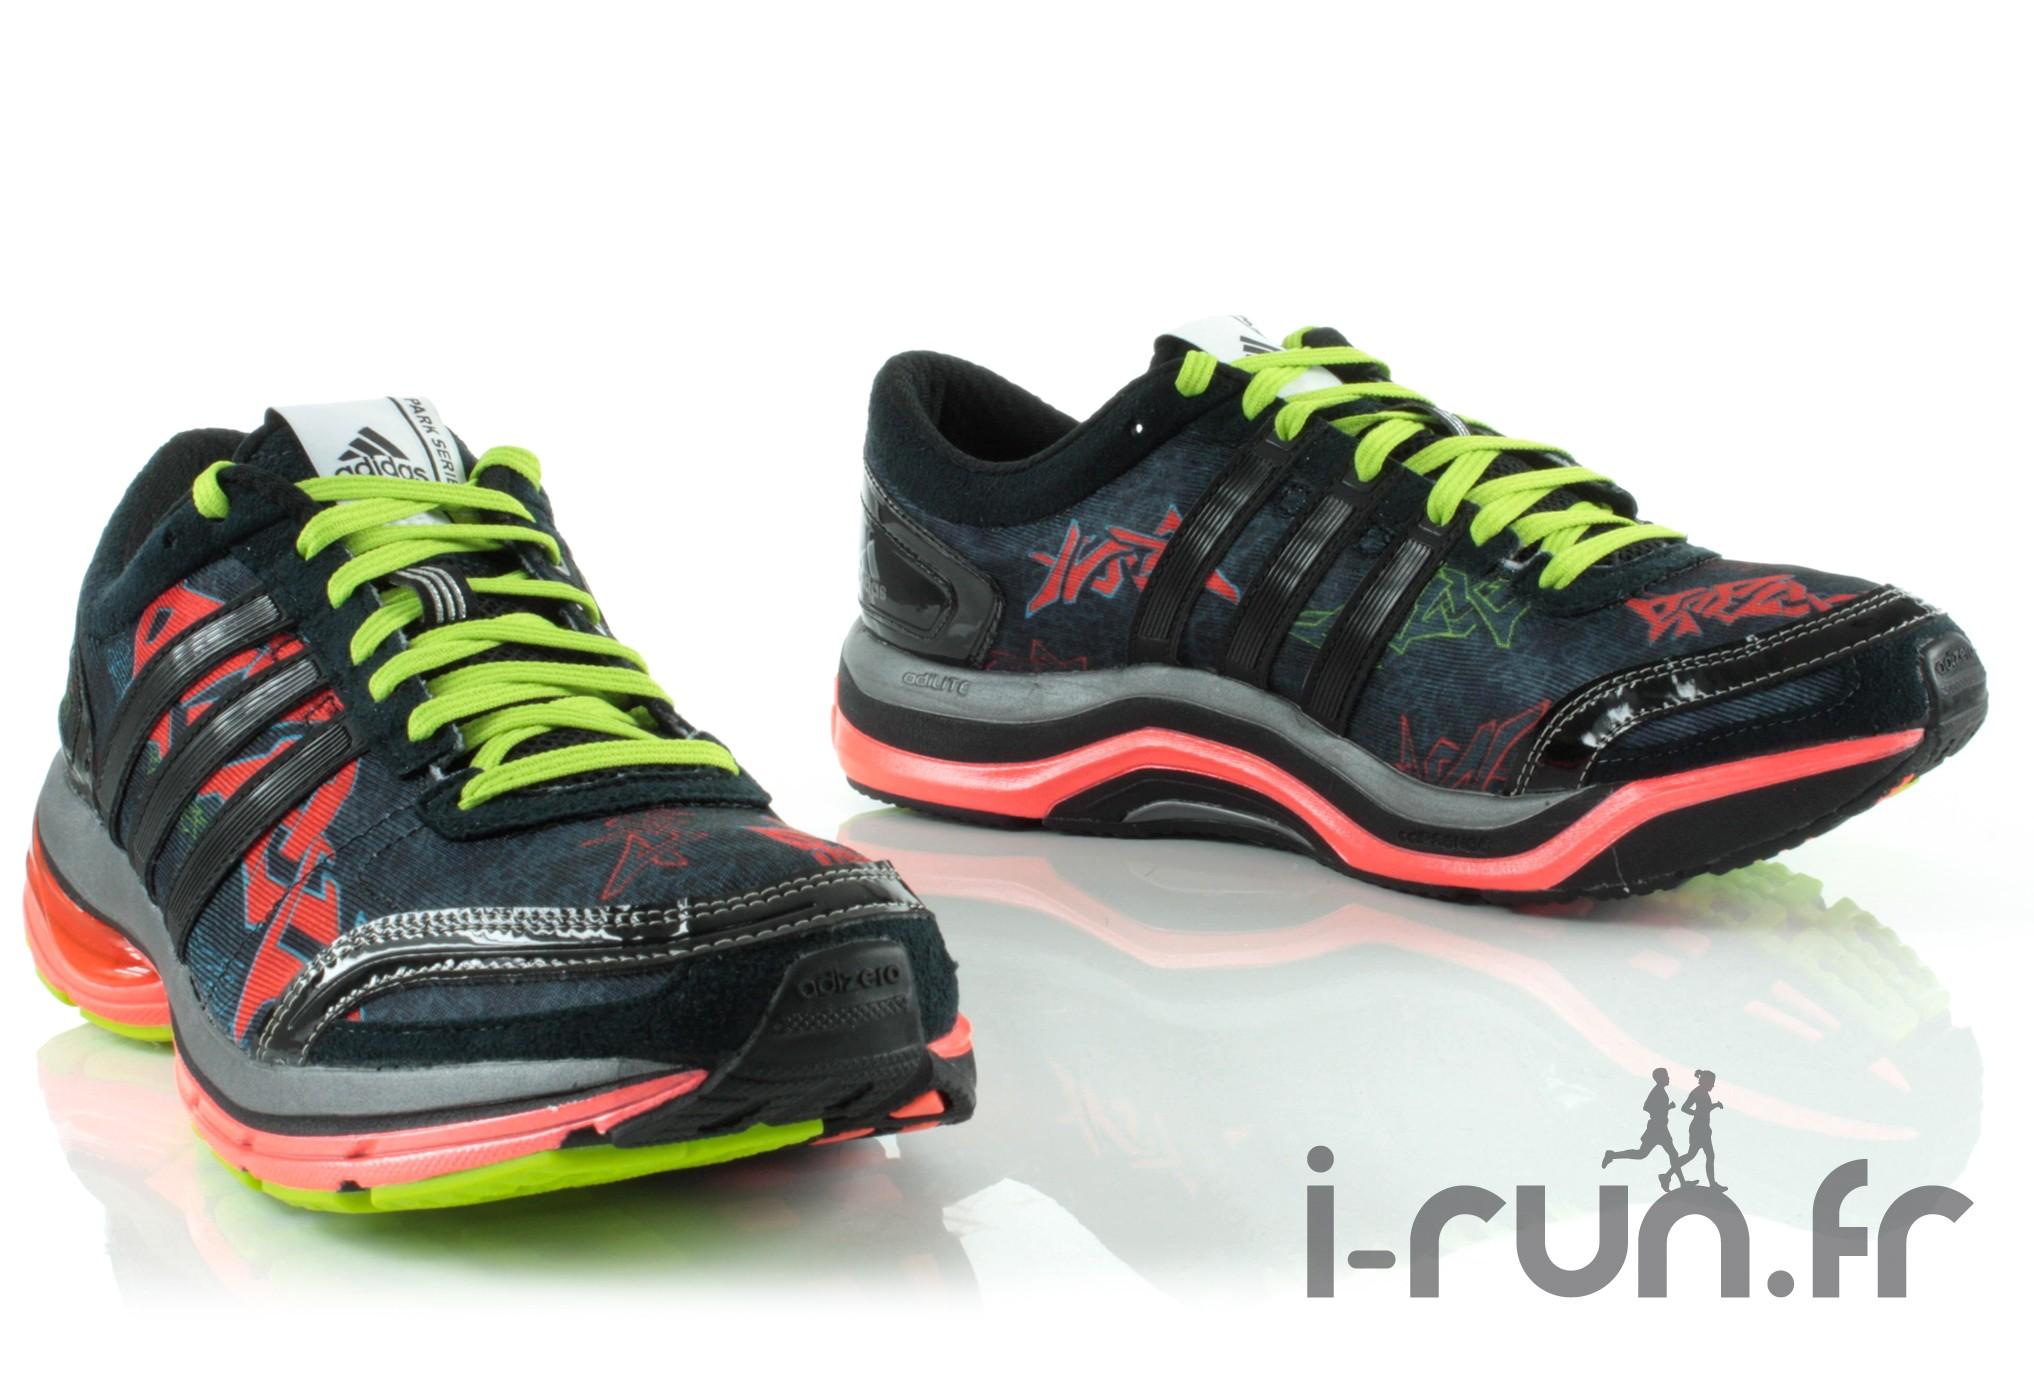 Adidas M Aegis Chaussures Sz Graphic 2 7401 Homme Adizero xwxrUaA